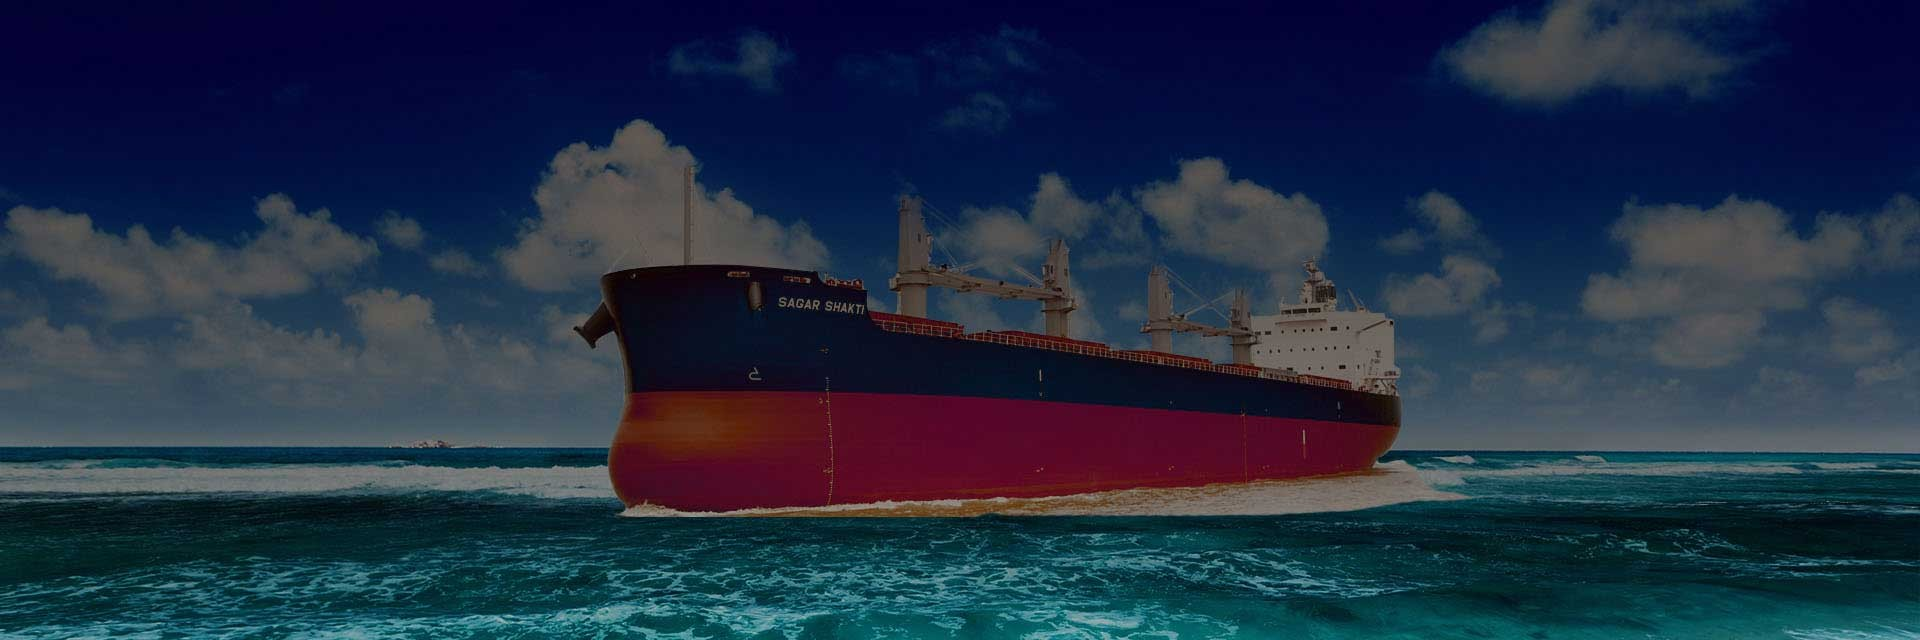 Tata NYK Shipping Pte  Ltd  | LinkedIn